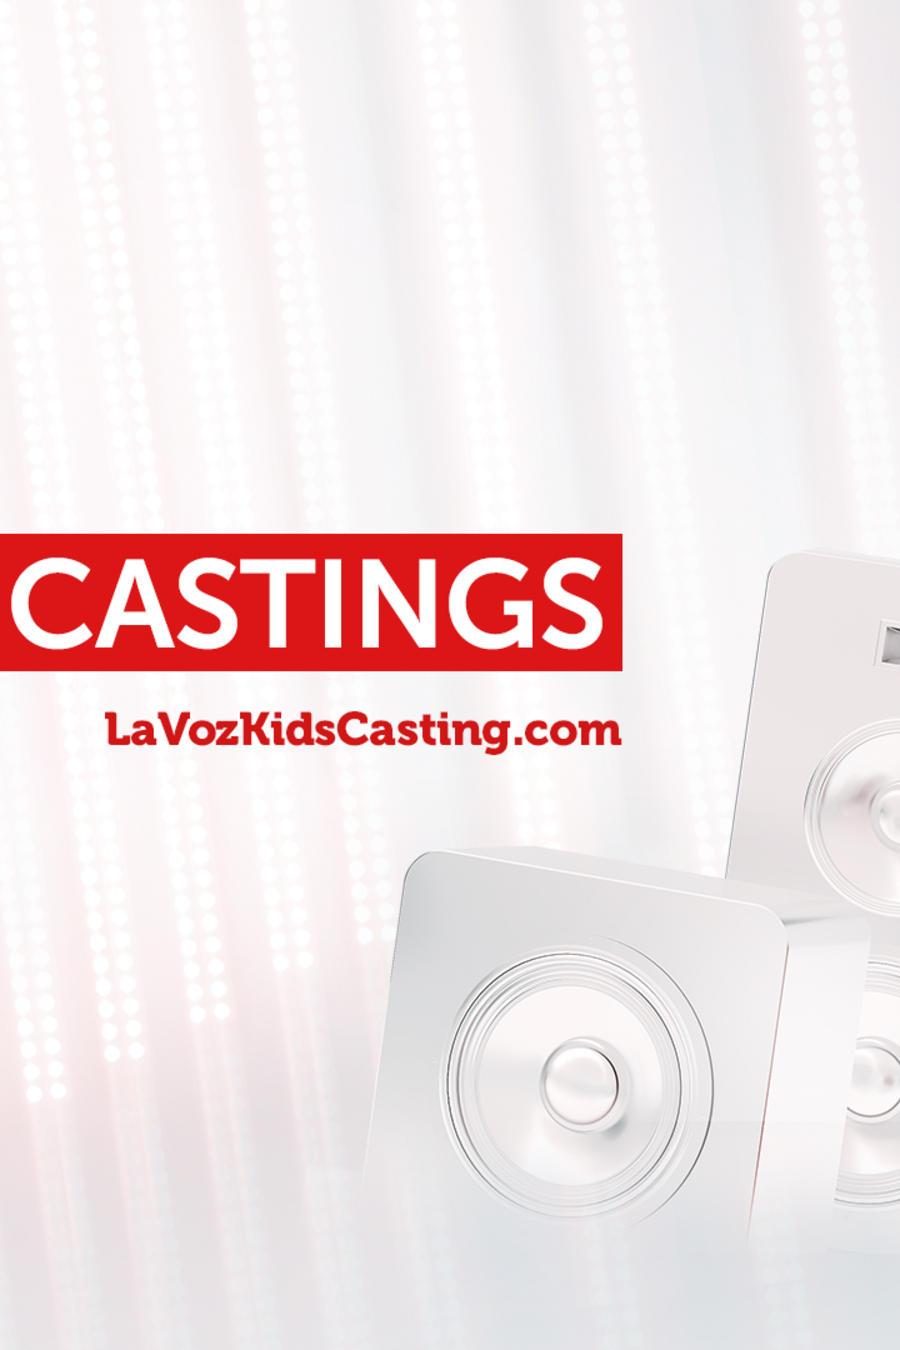 La Voz Kids Castings